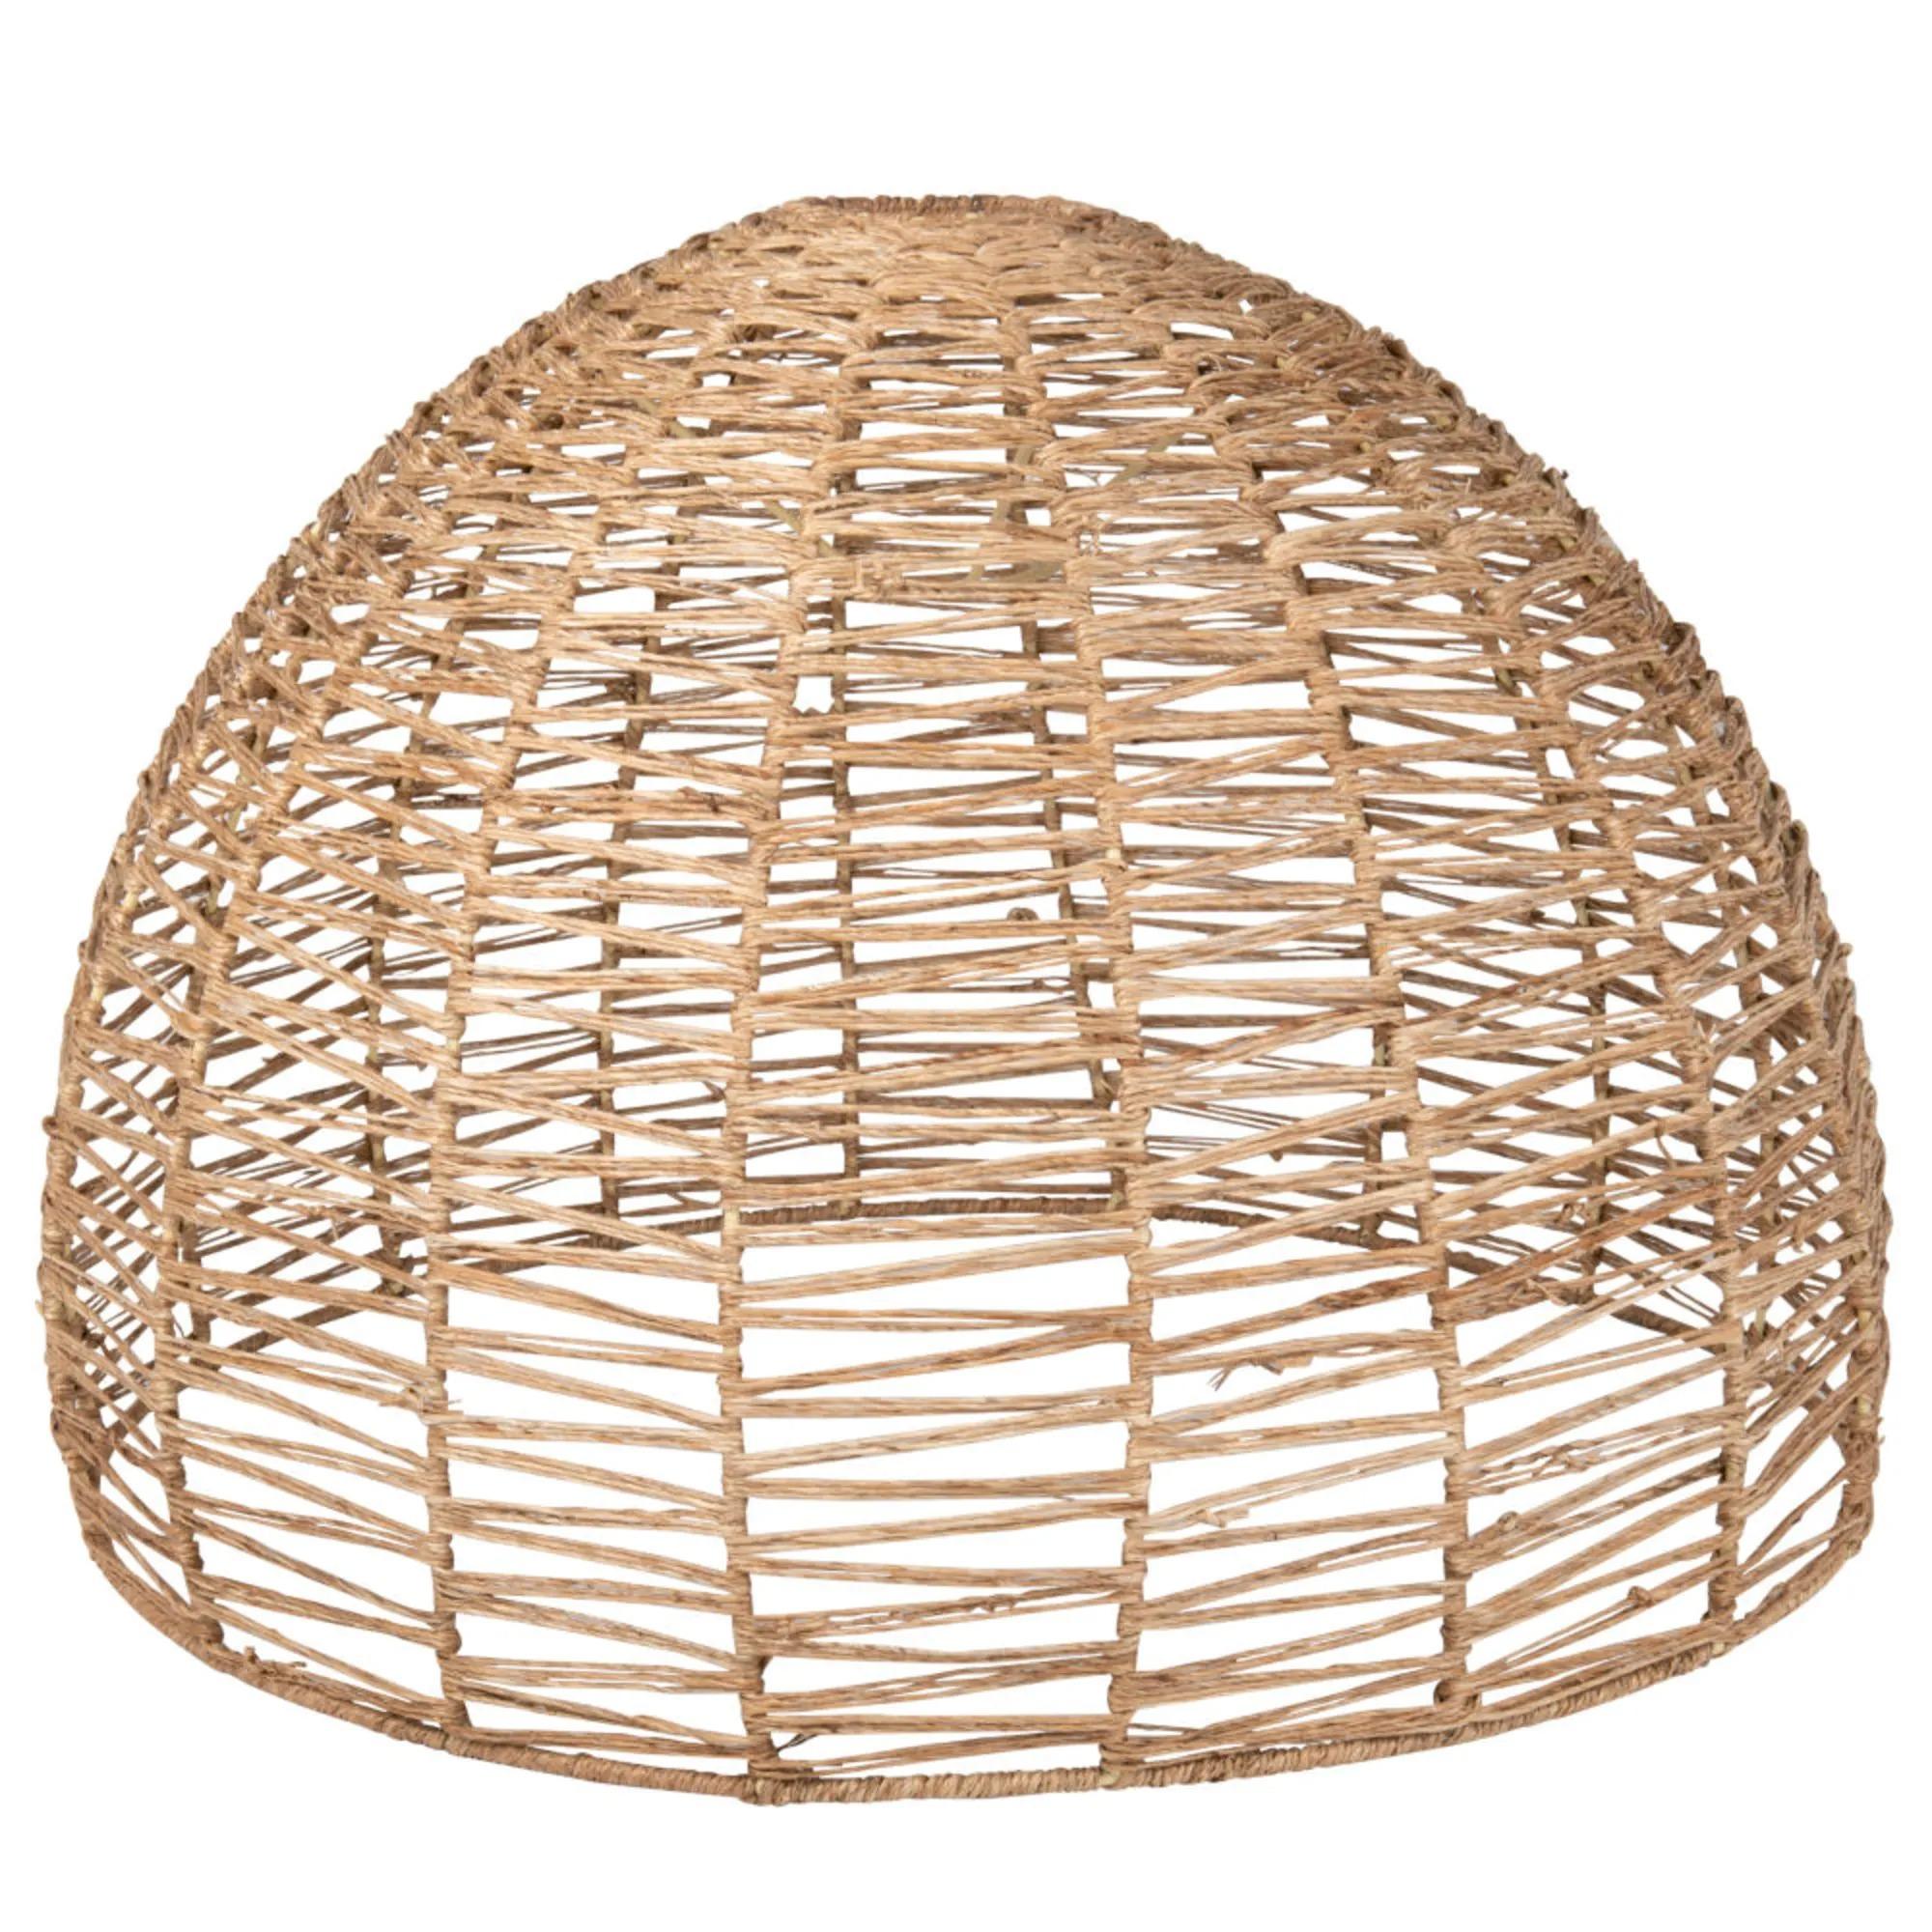 Pantalla para lámpara de techo de fibra vegetal